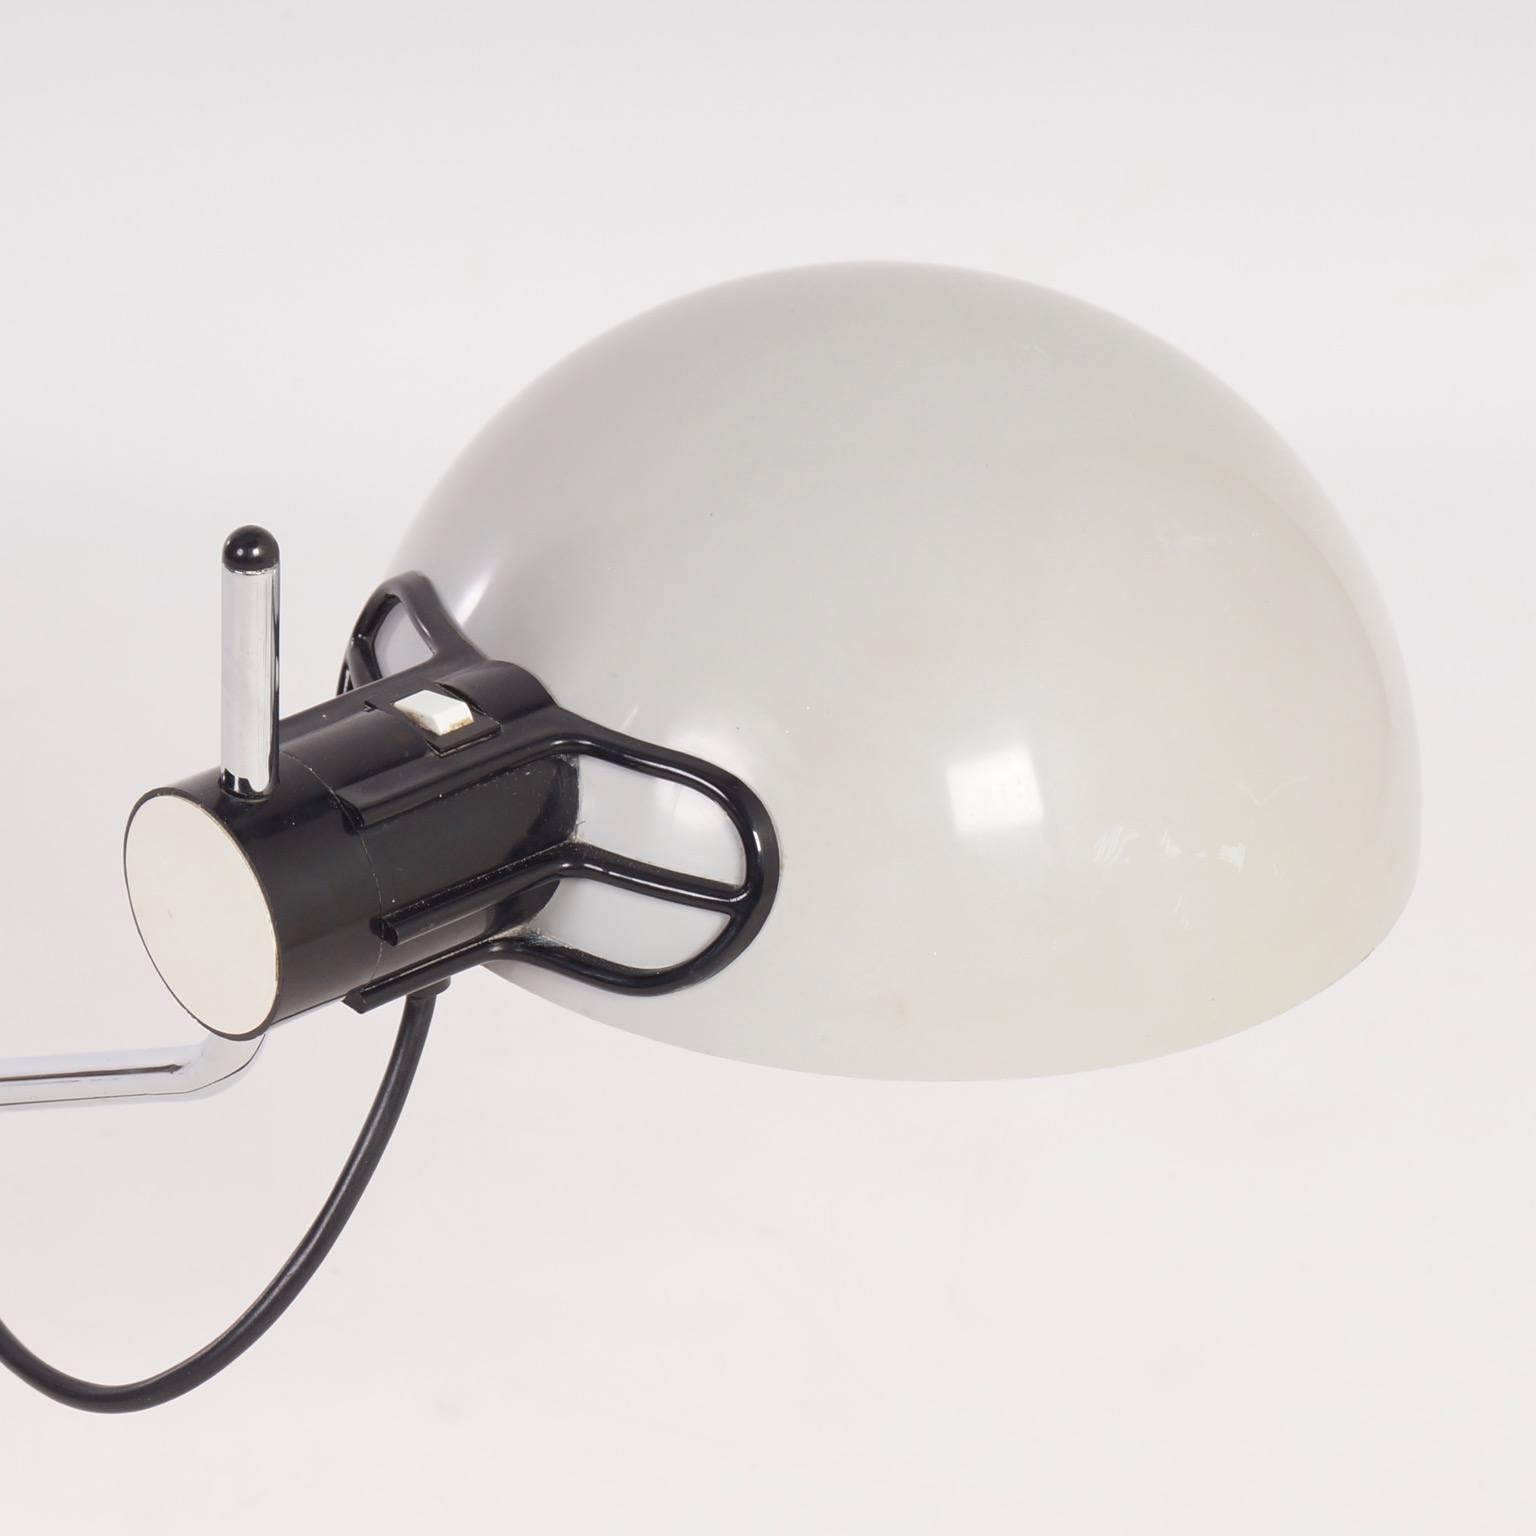 Iguzzini Desk Lamp Vintage Design Lamps Italian Modern